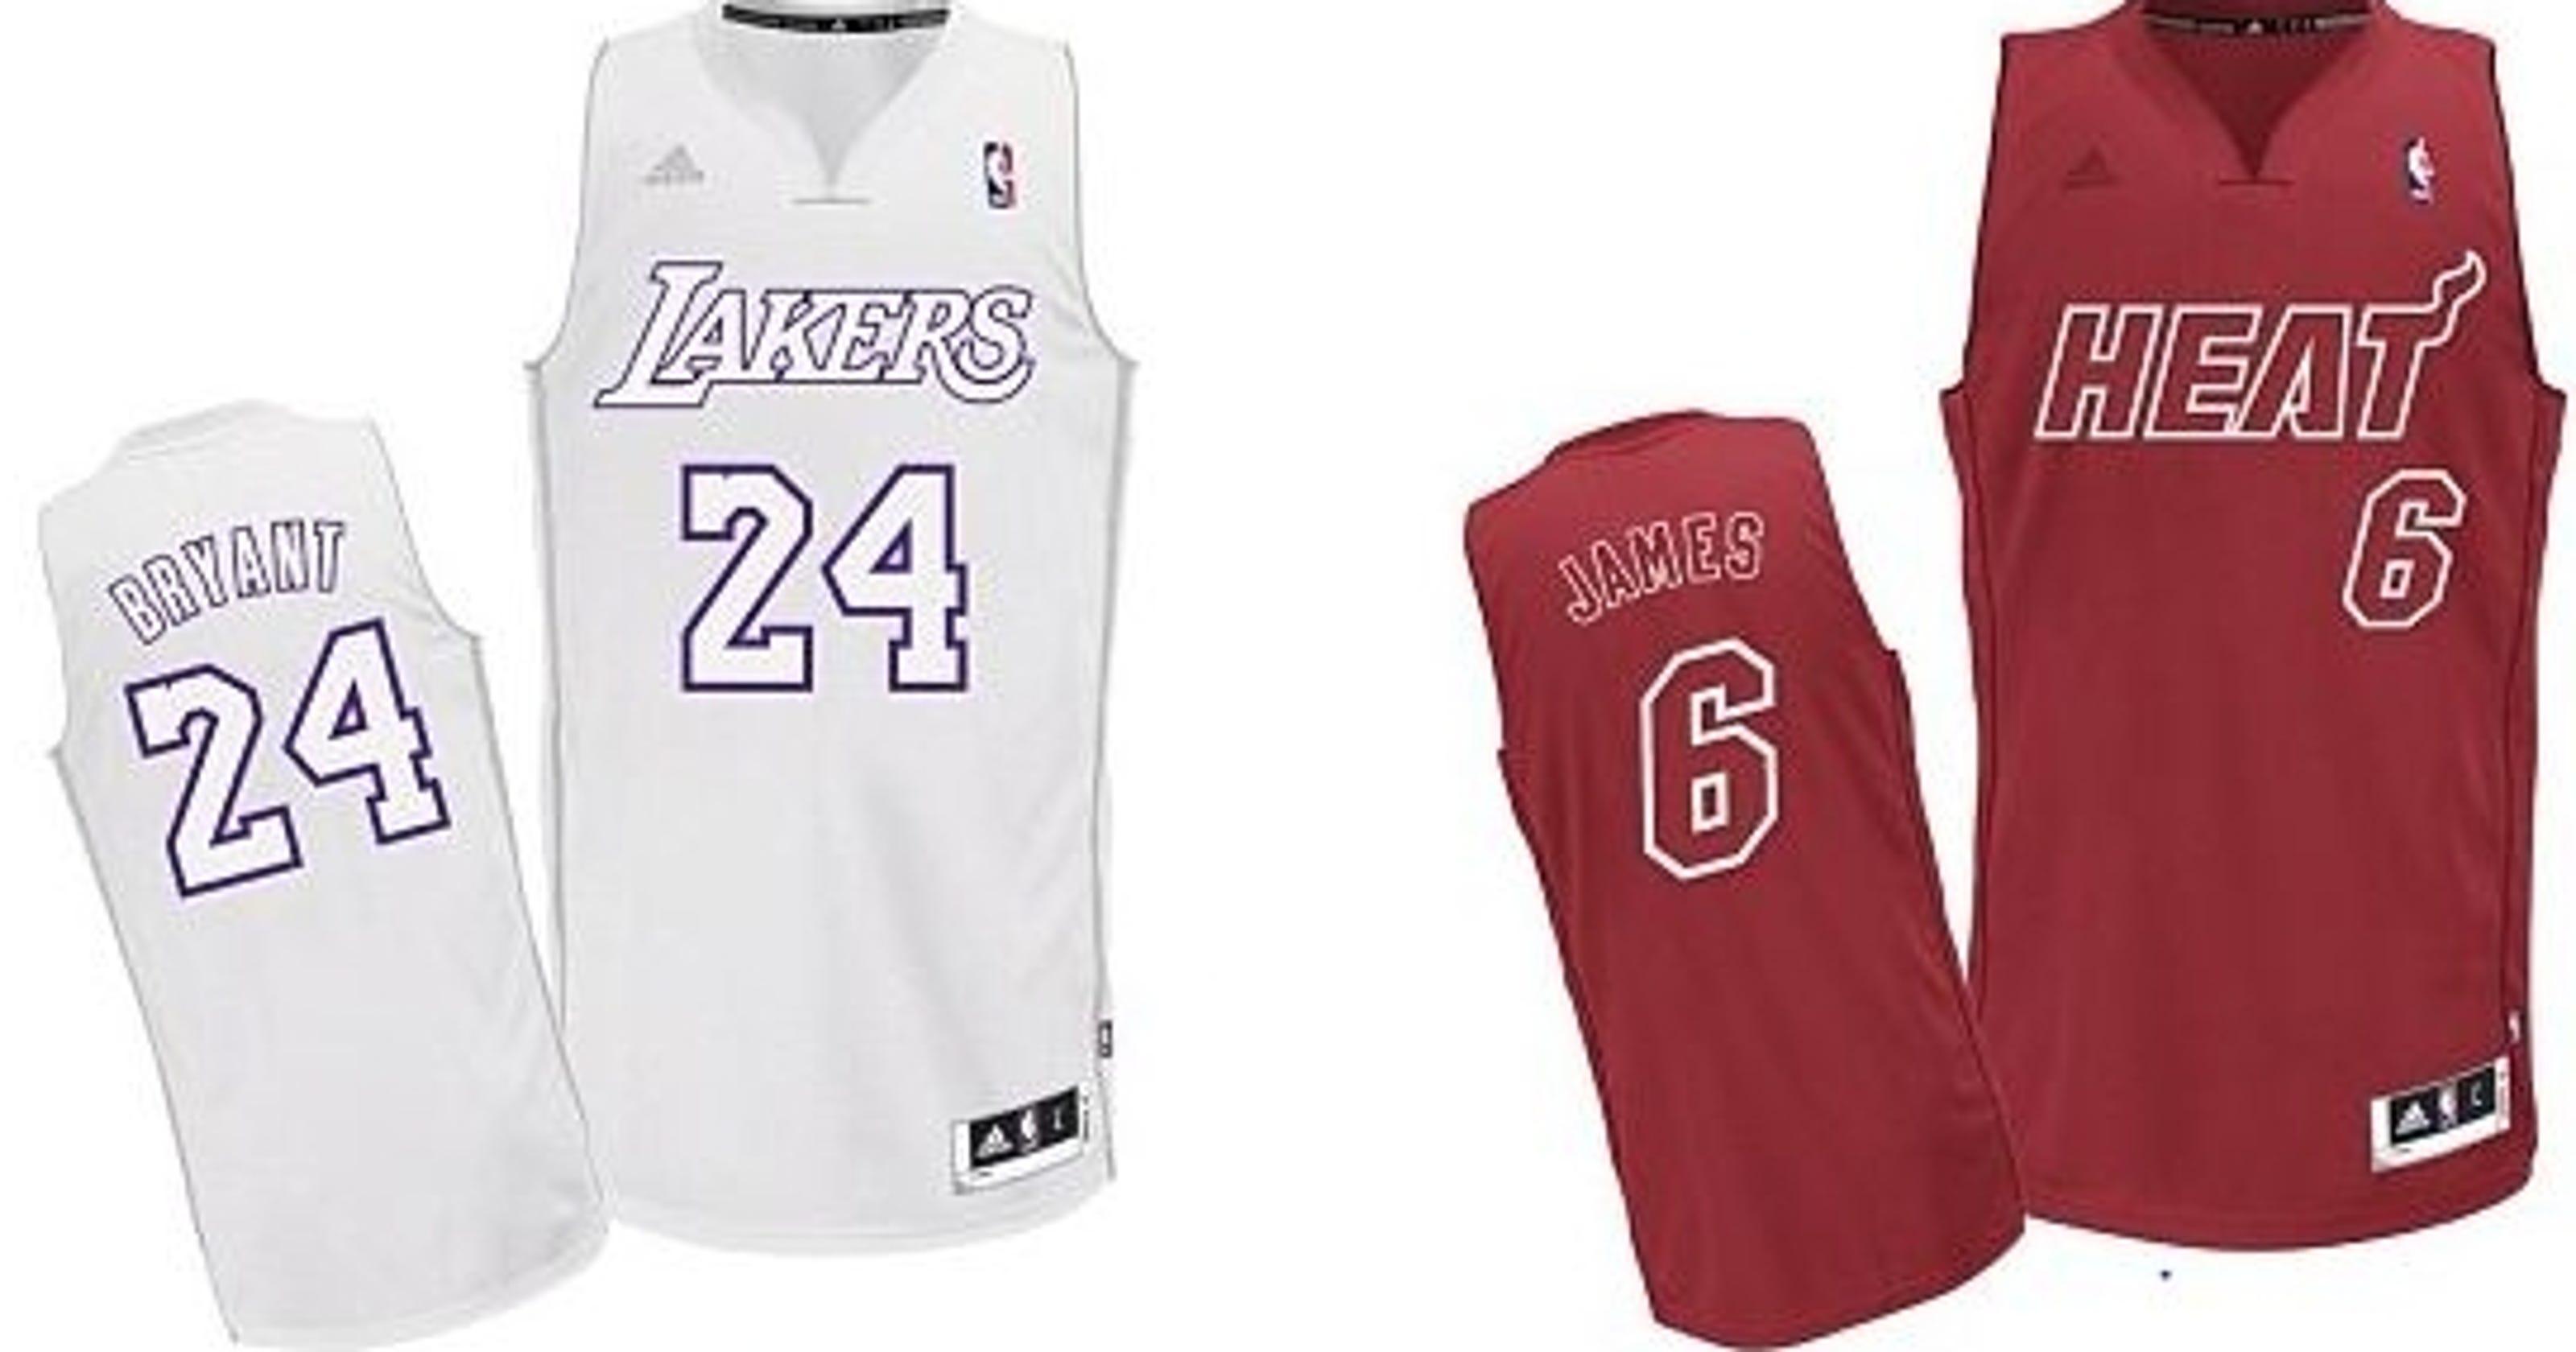 7da3b9d1b Christmas Day NBA jerseys unveiled for 2012 games